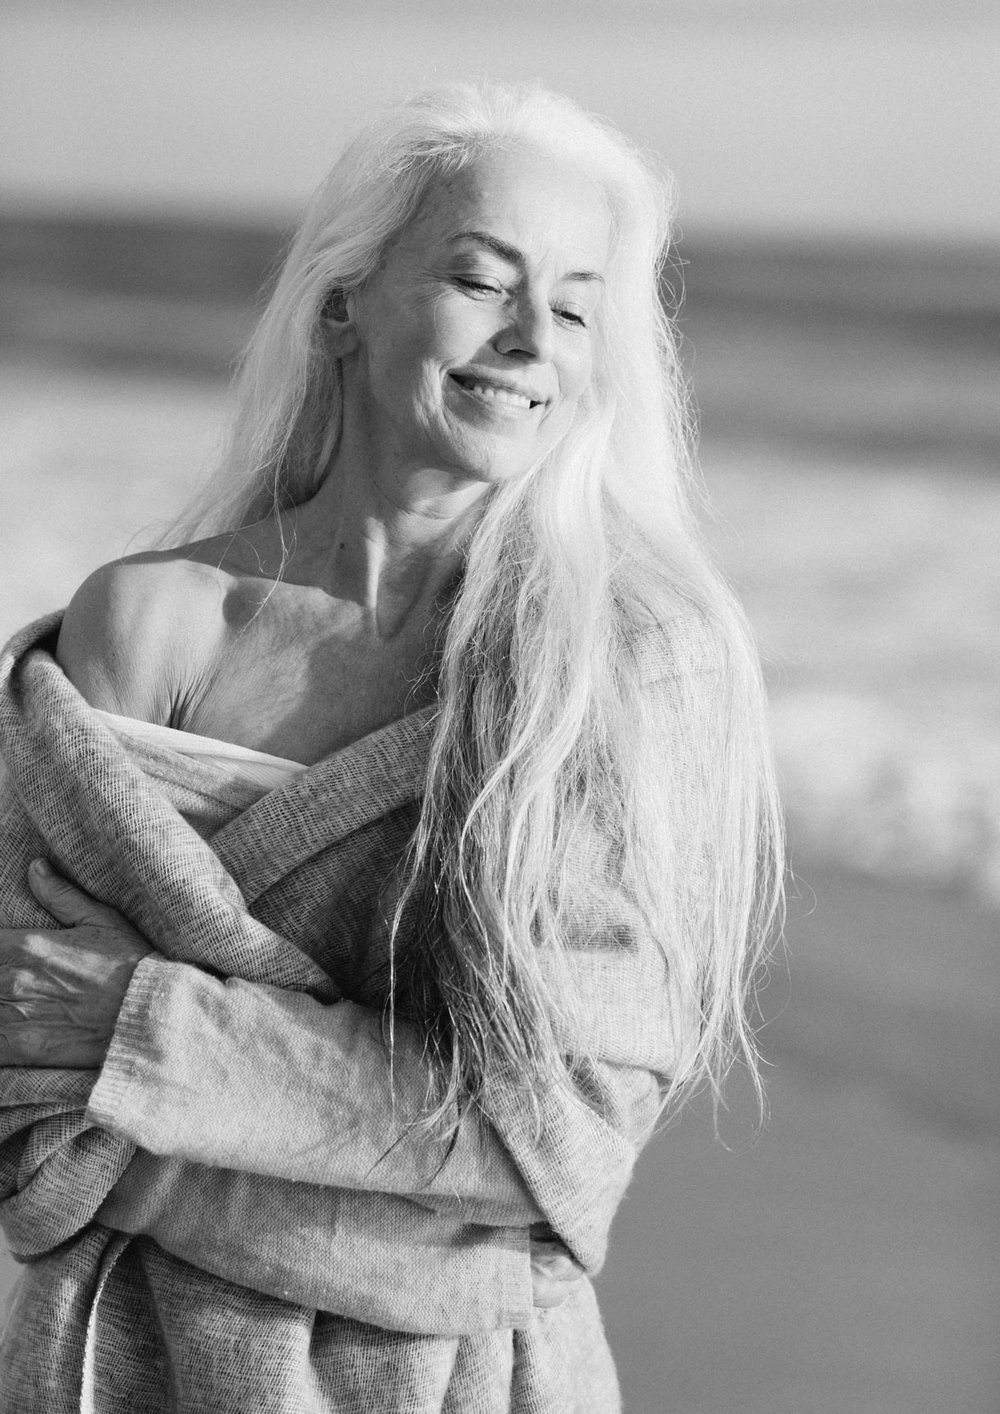 French model Yasmina Rossi: biography, career, personal life 16